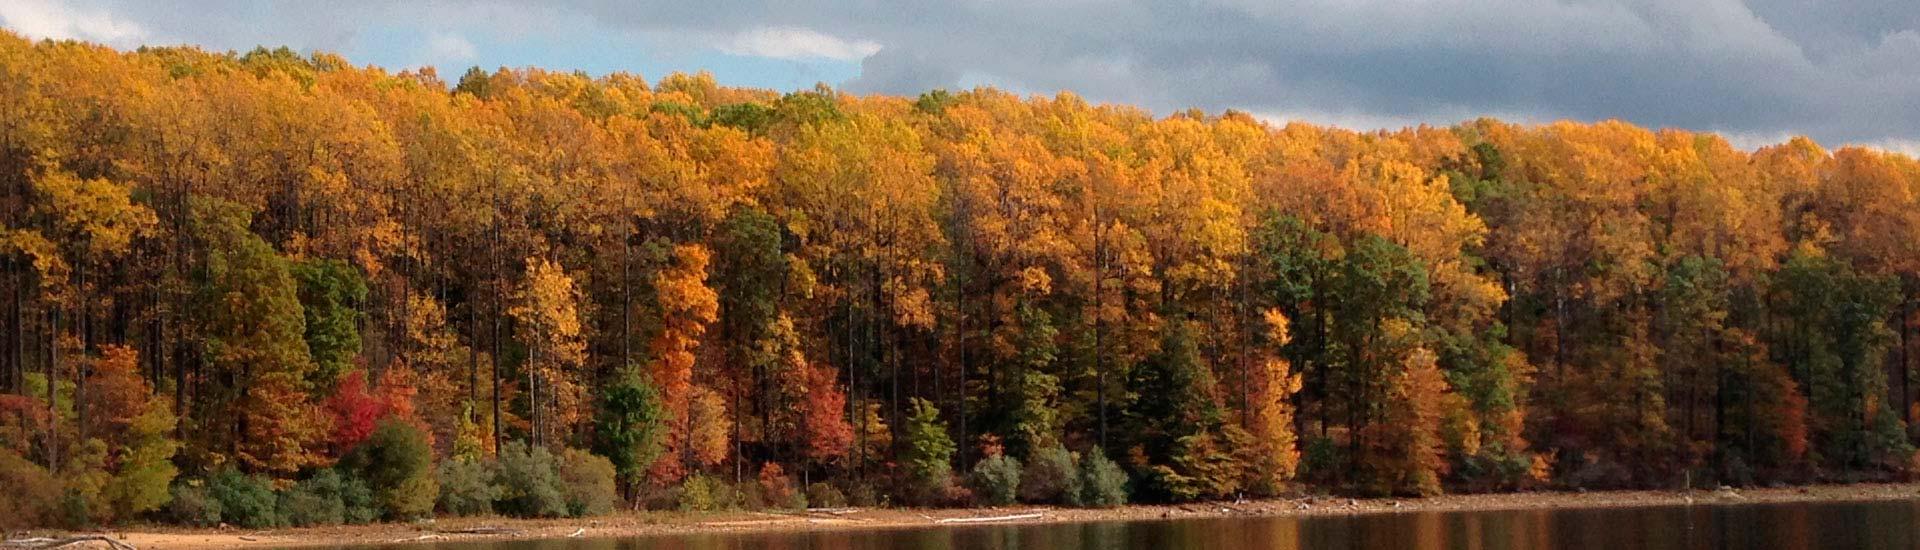 Merrill Creek Reservoir-mcr2